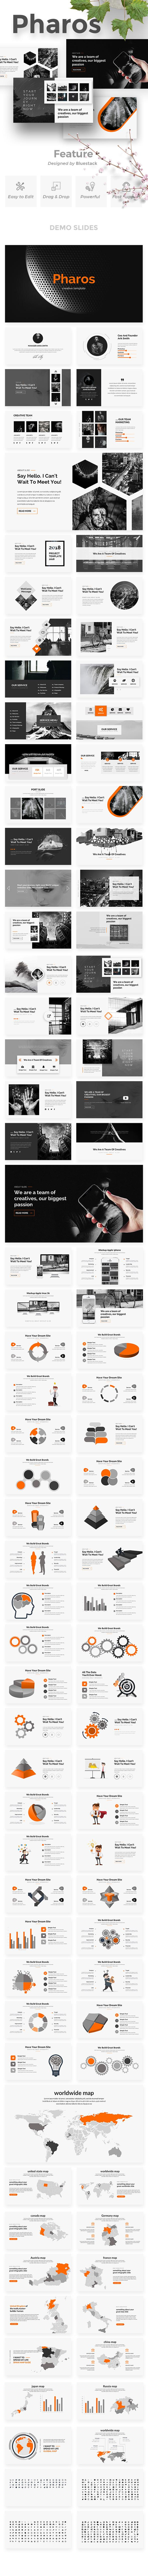 GraphicRiver Pharos Creative Google Slide Template 21163051